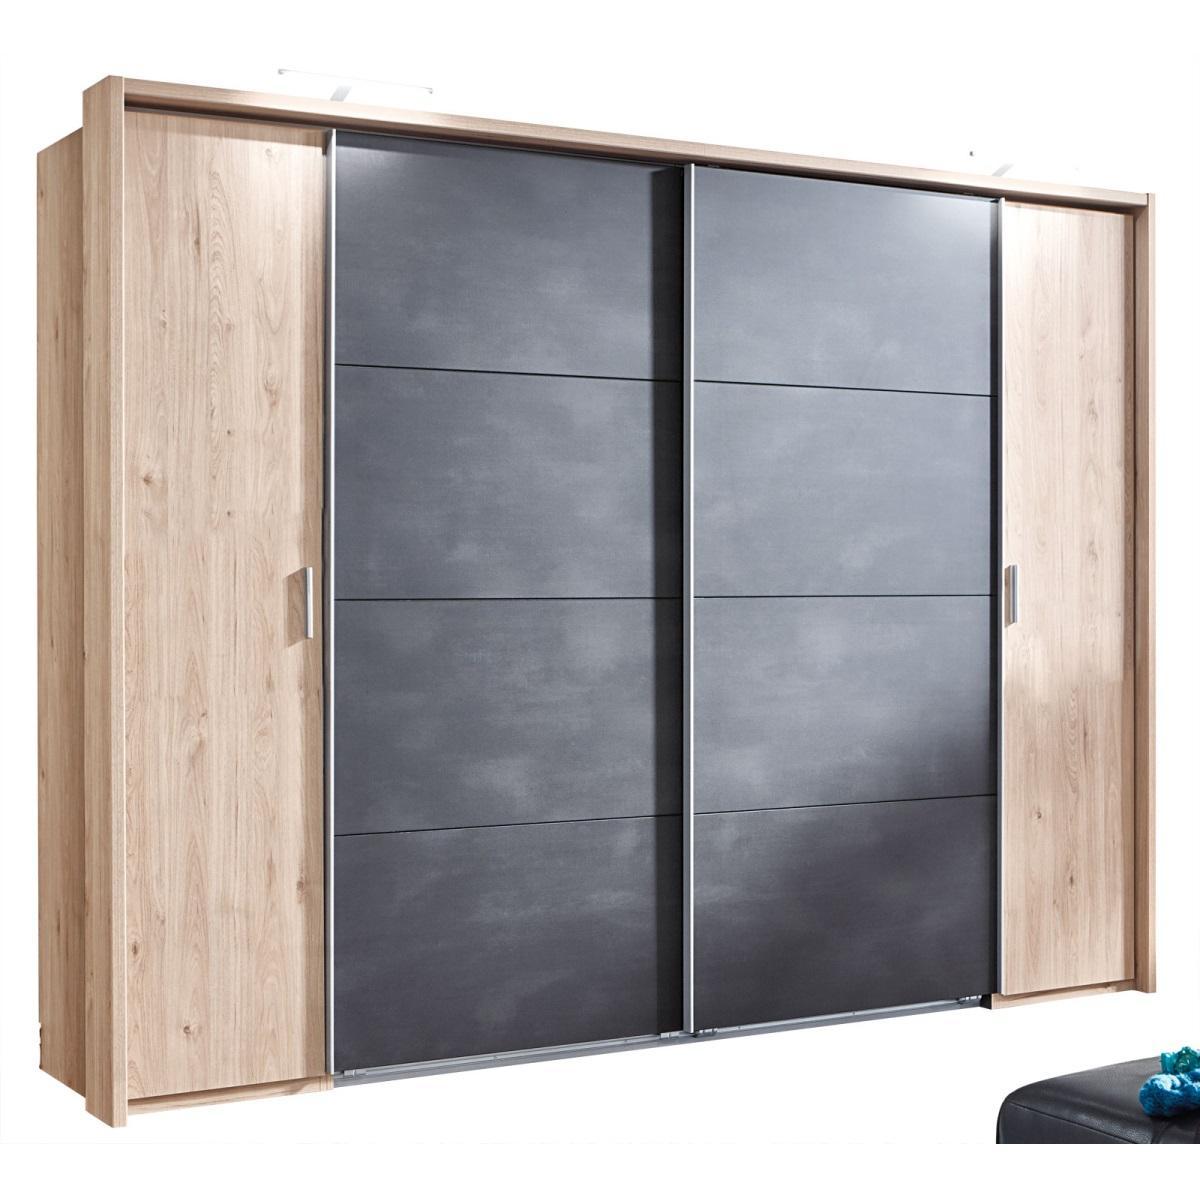 Kleiderschrank Holz Grau